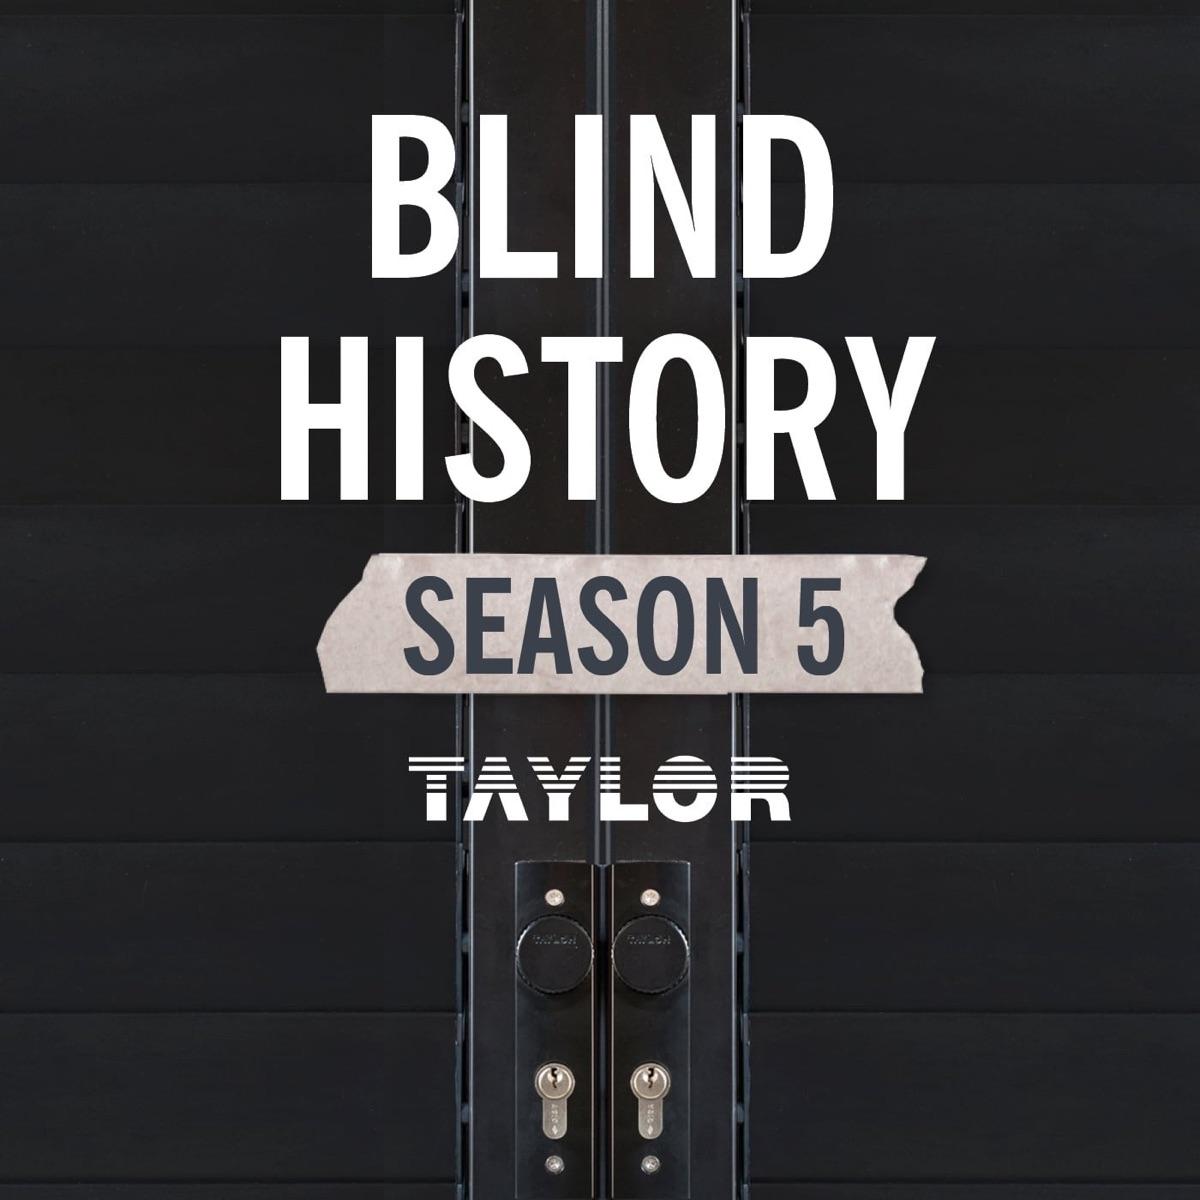 Blind History